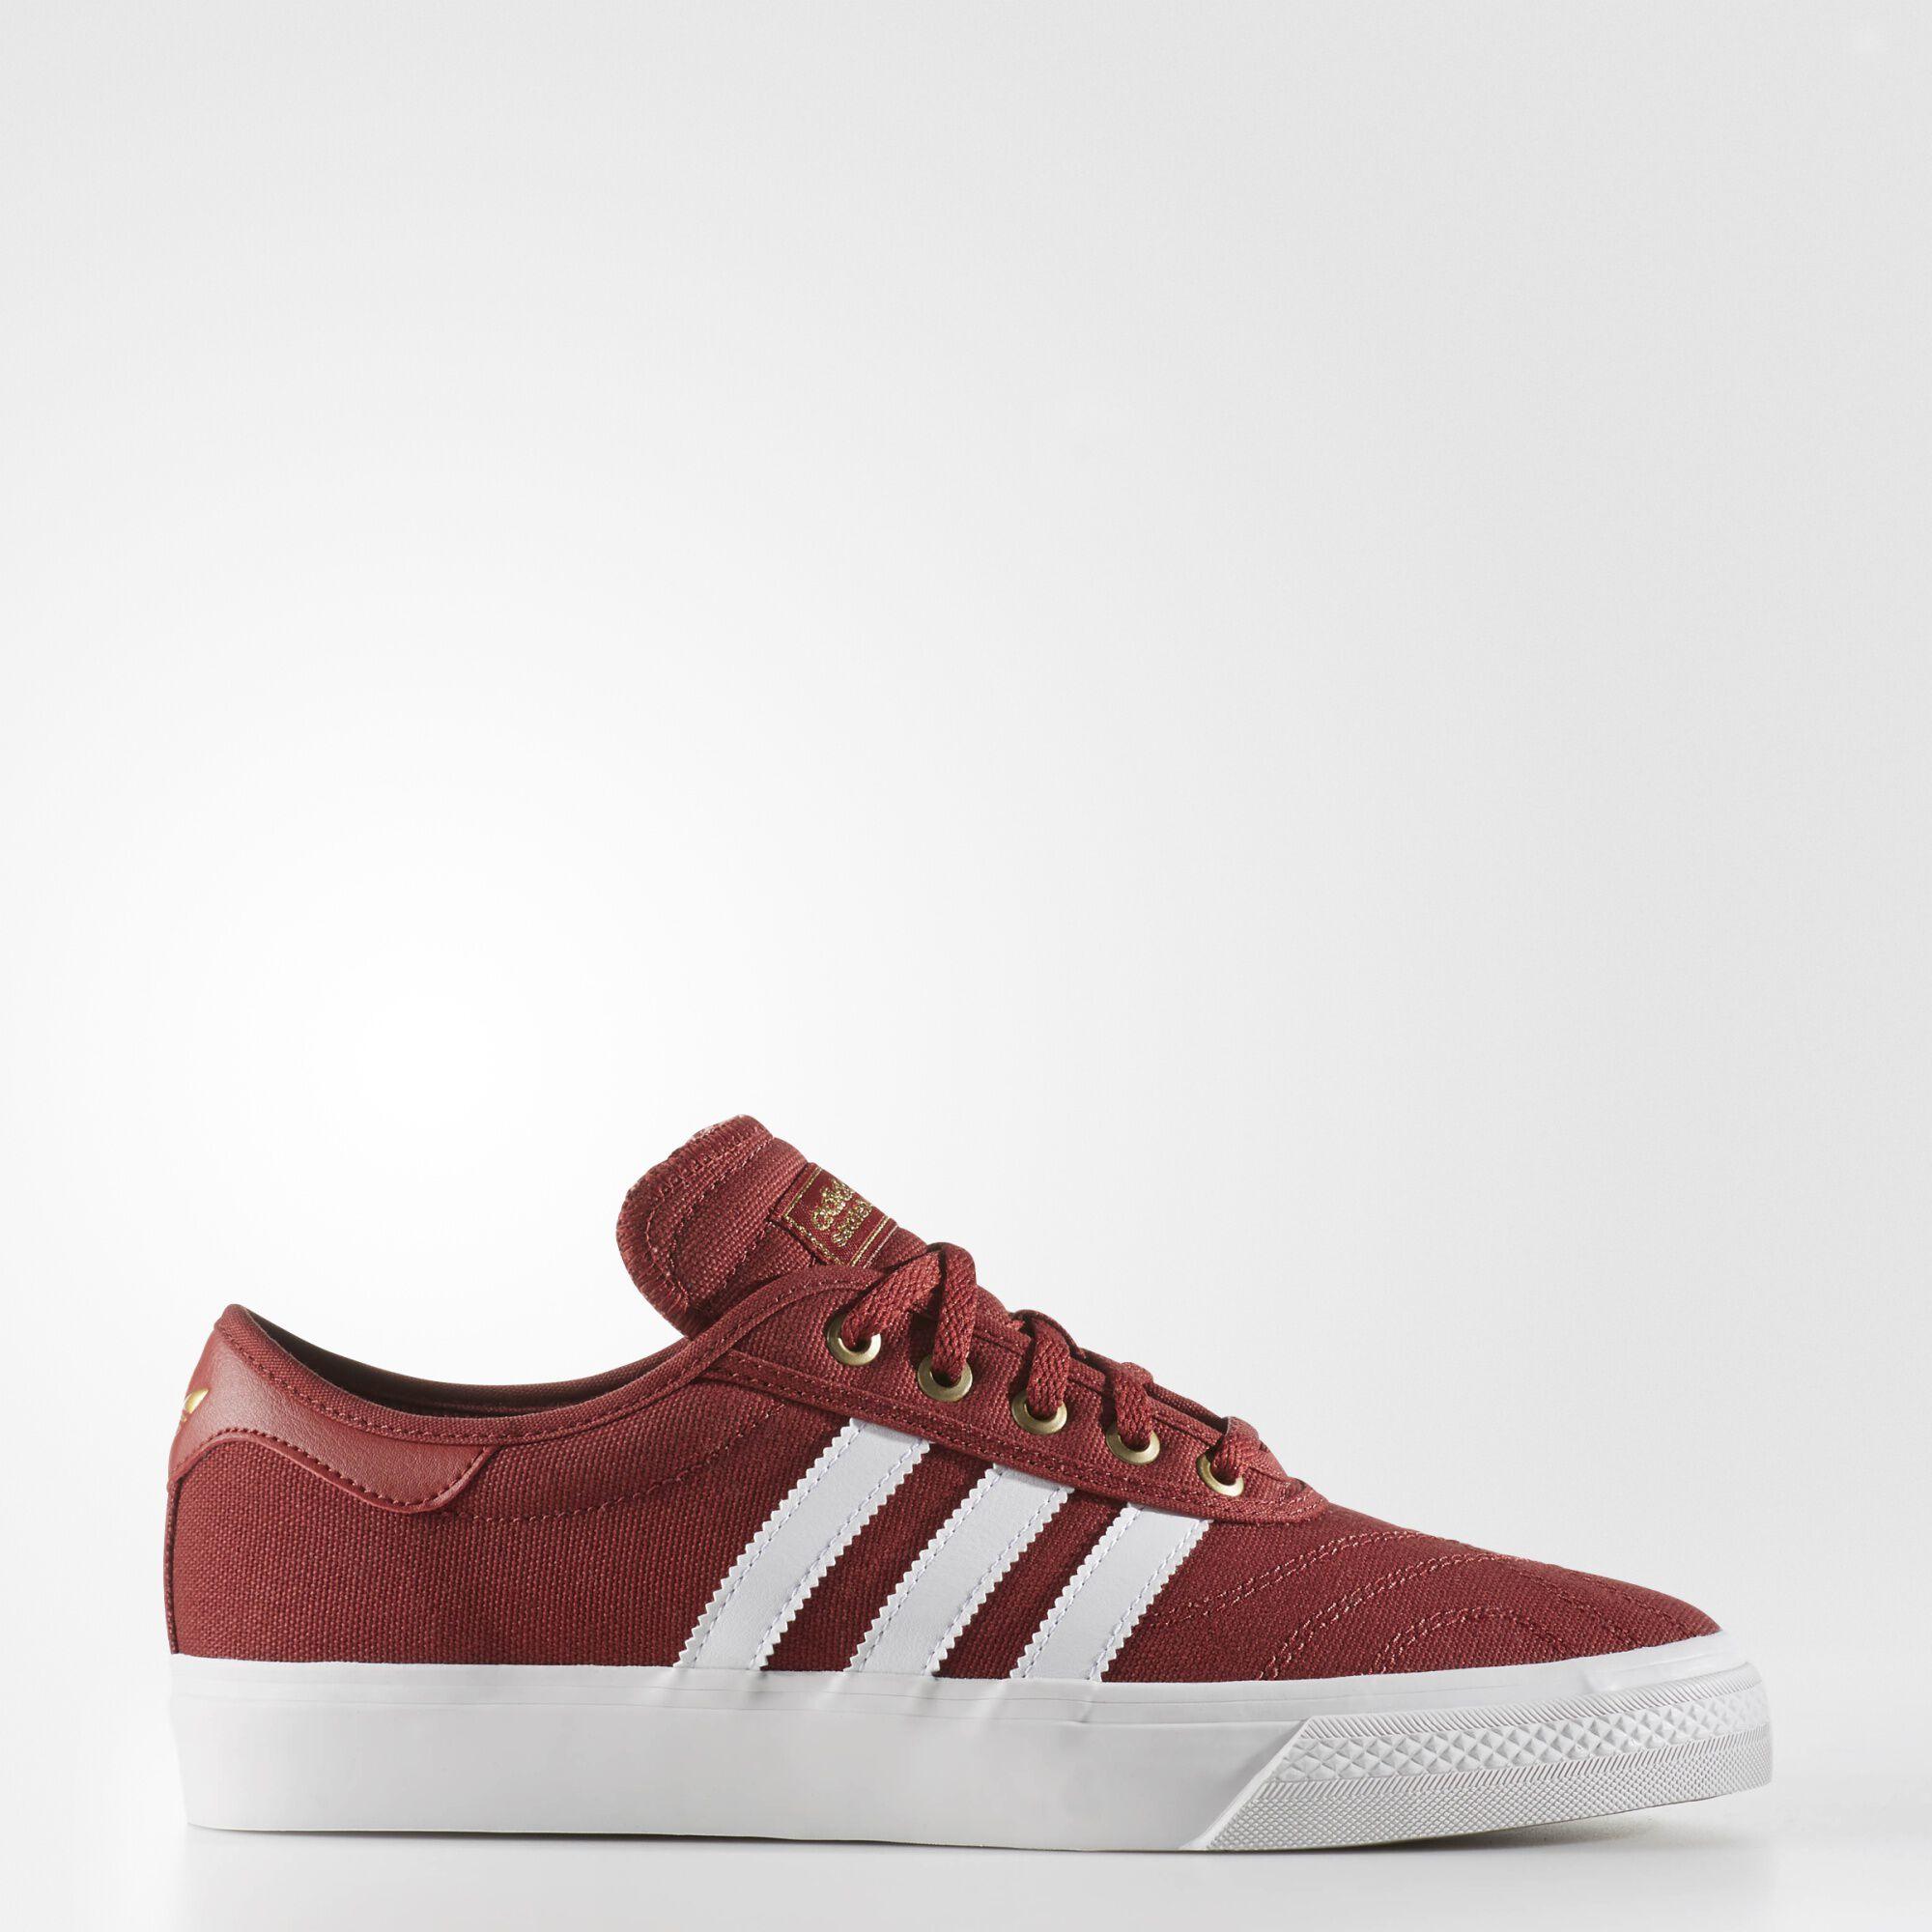 Red Mens Adidas Skateboarding Rayado Mid Shoes Cheap Payment